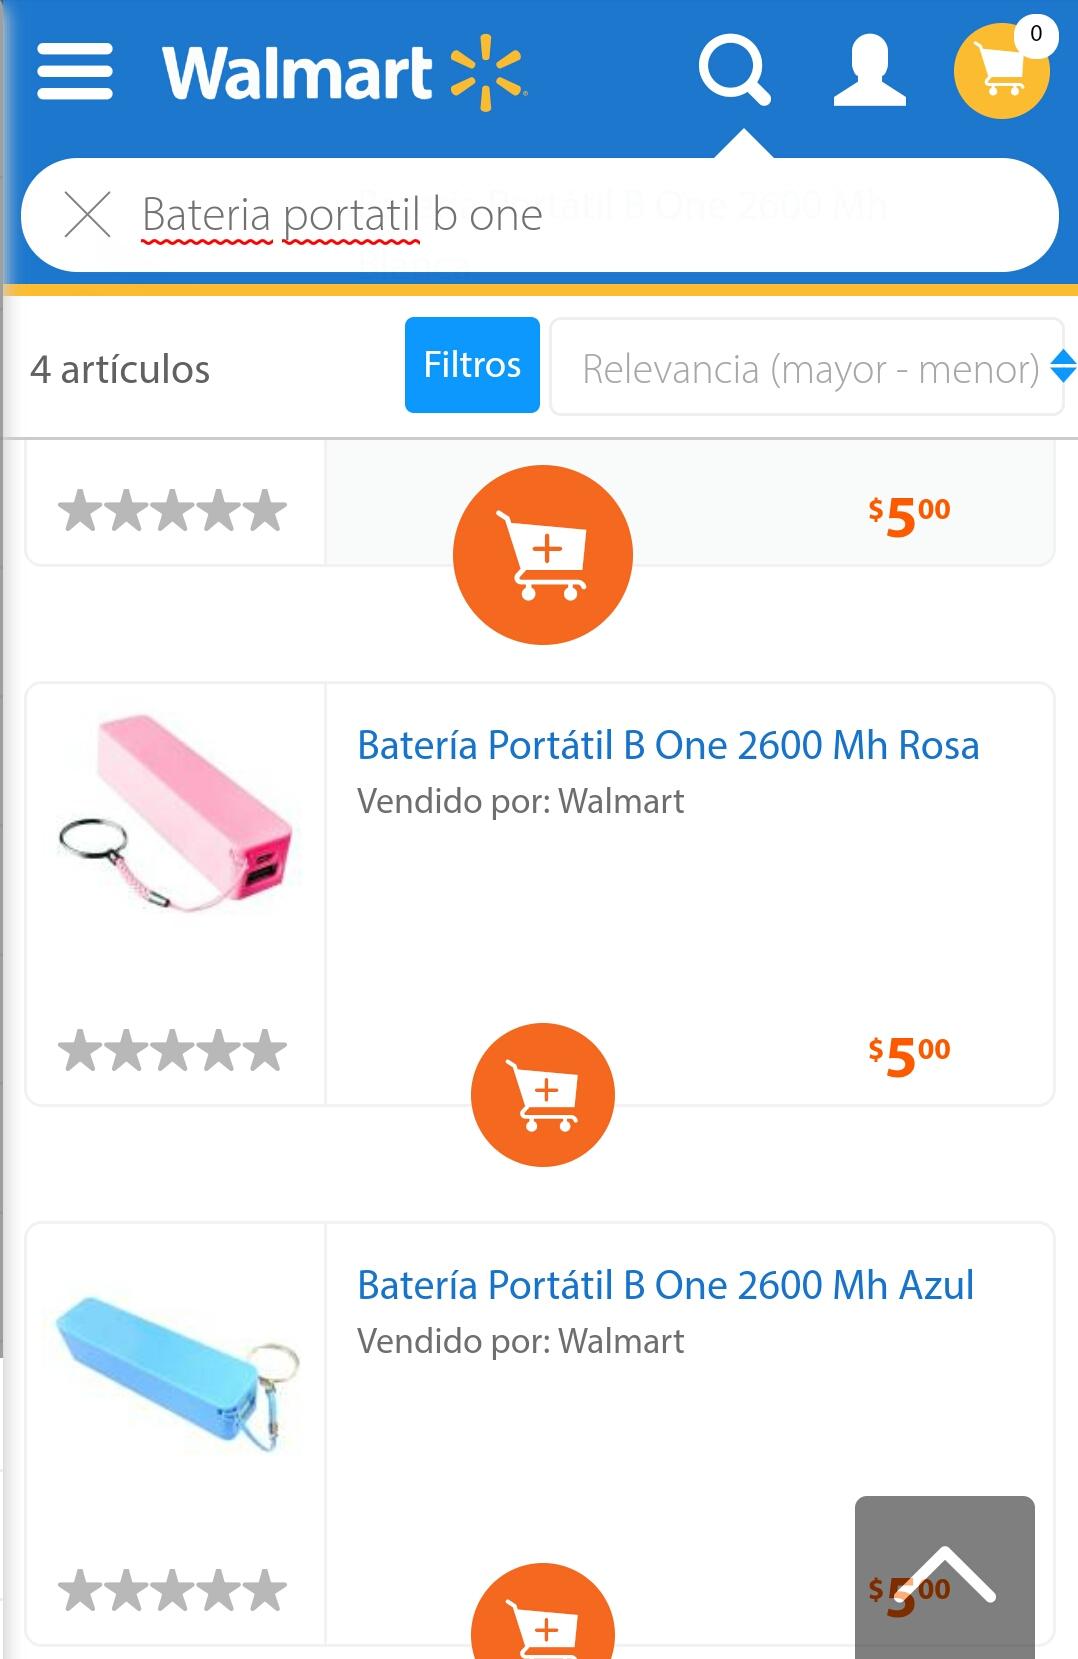 Walmart línea: Baterias 2600Mh solo $5